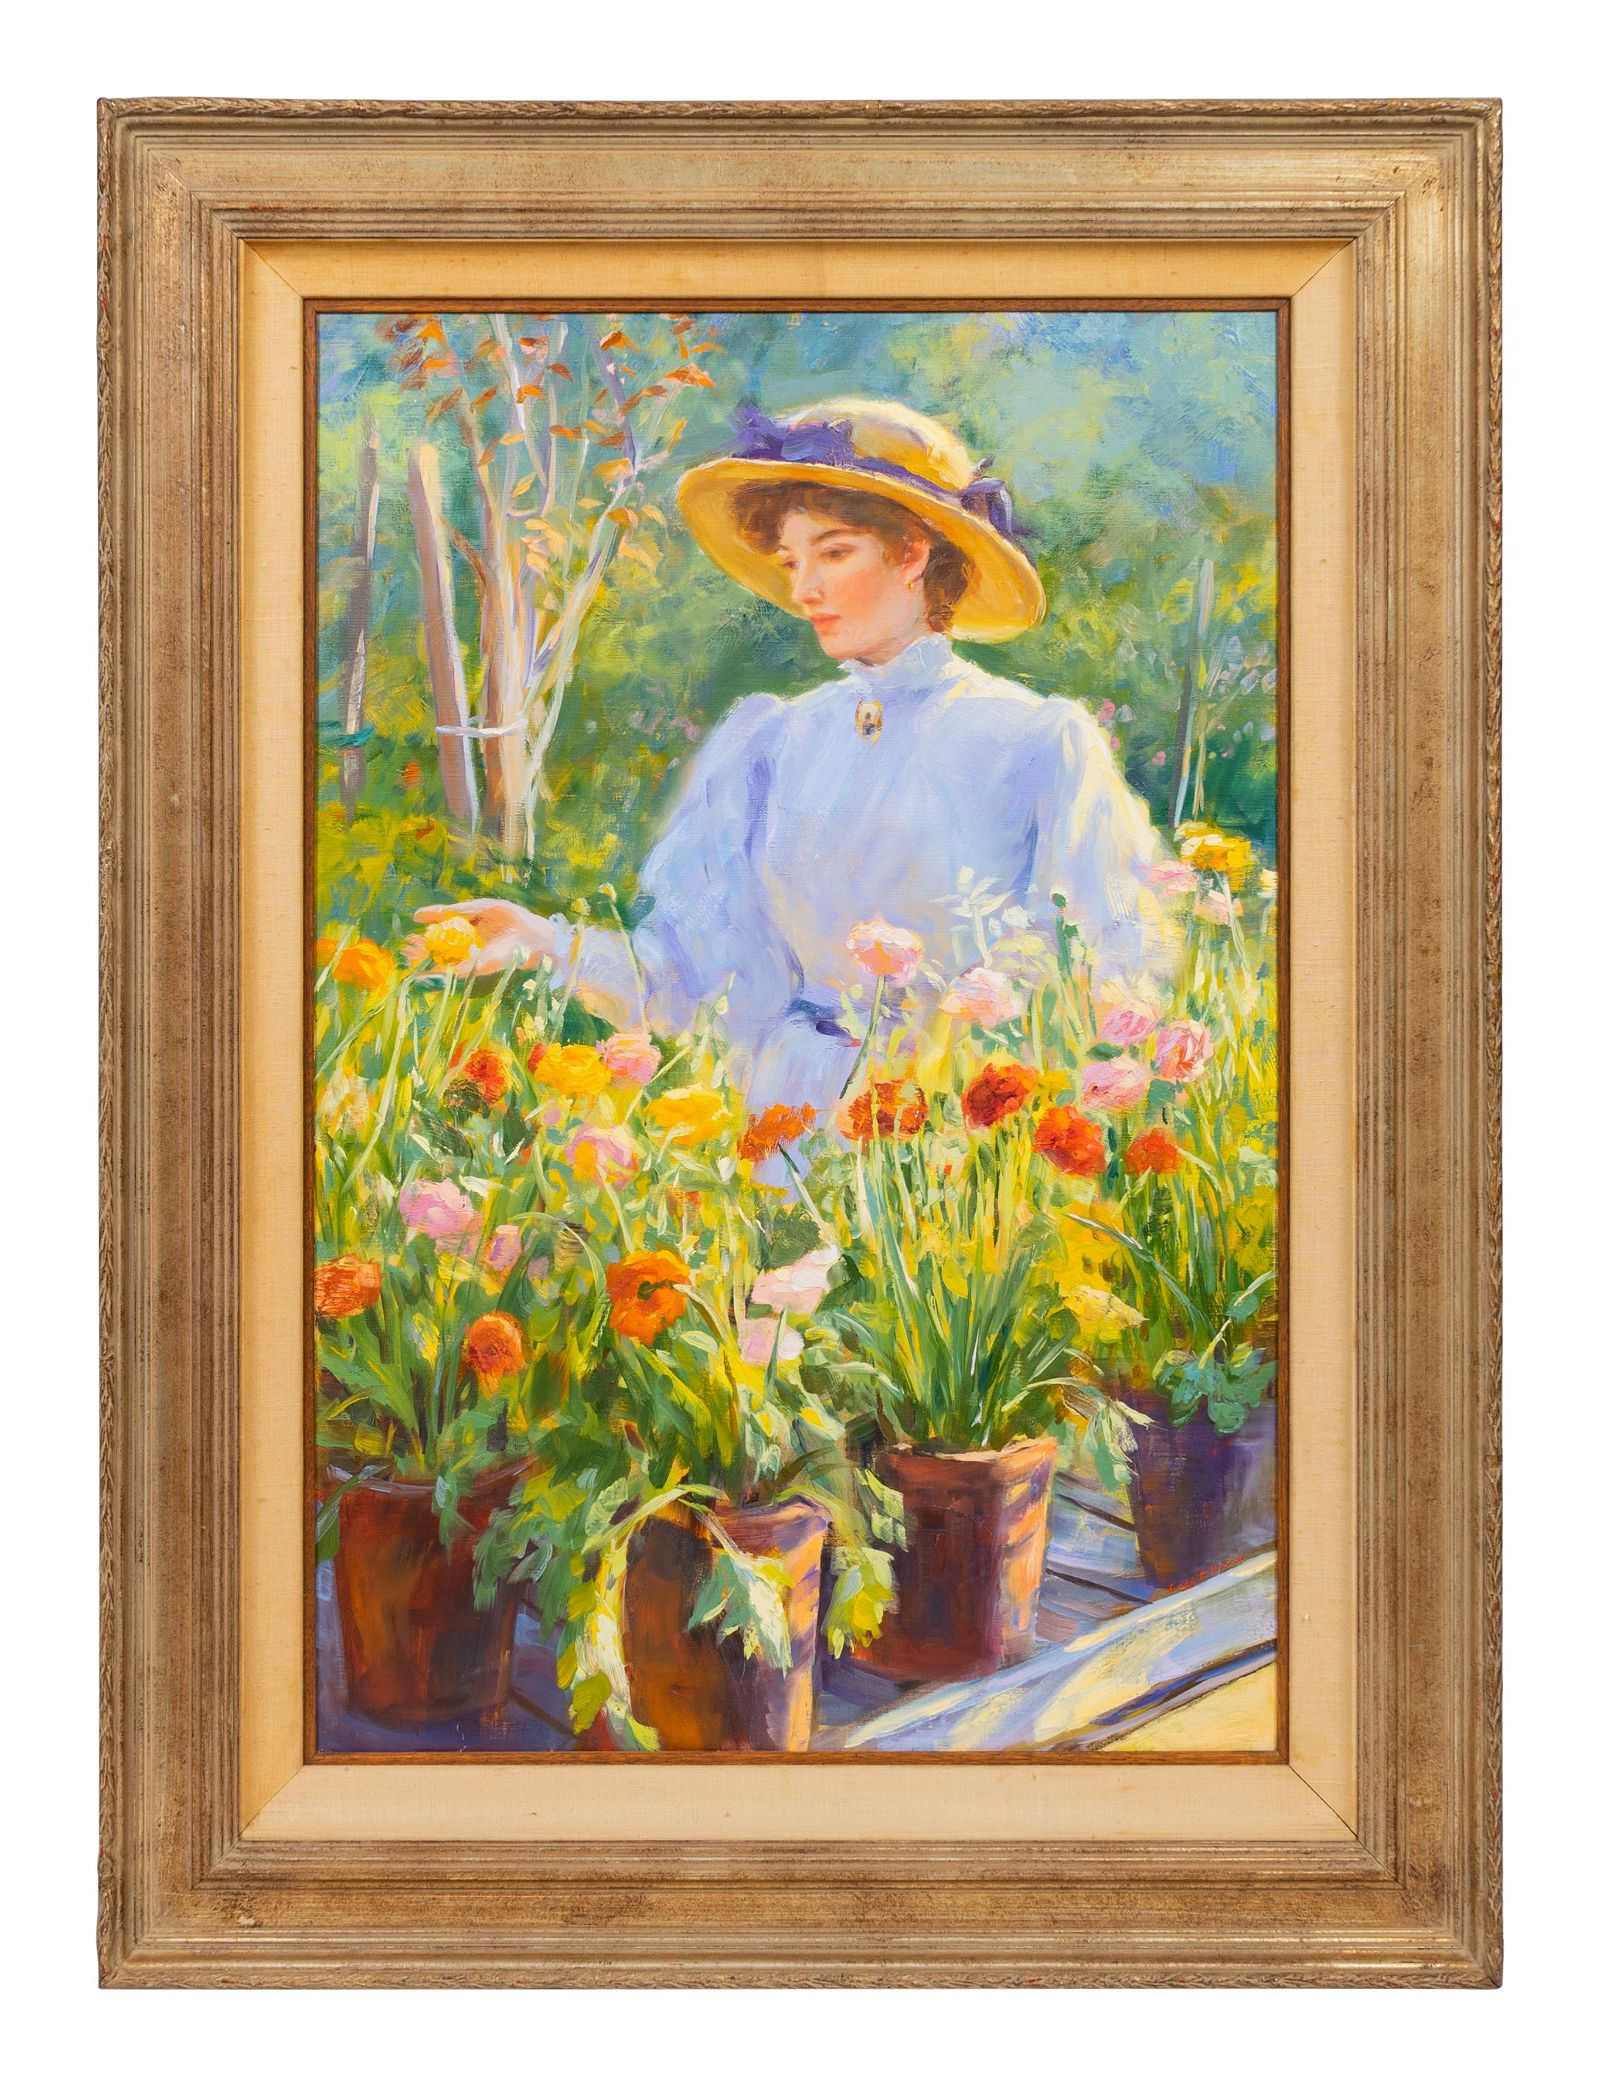 Gregory F. Harris (American, b. 1953) Spring Flowers,